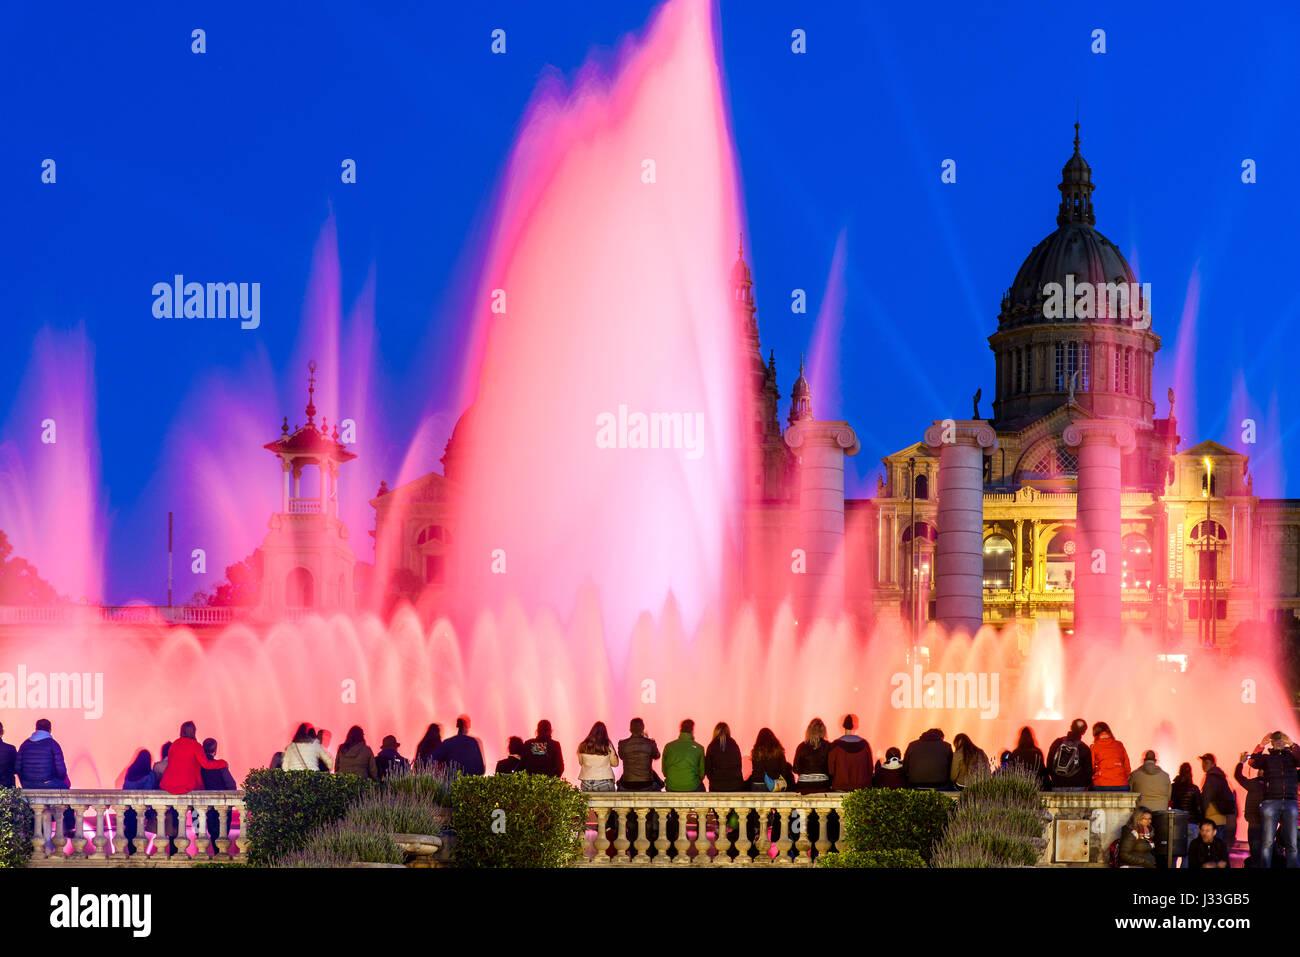 Nacht-Licht-Show am magischen Brunnen oder Font Magica, Barcelona, Katalonien, Spanien Stockbild